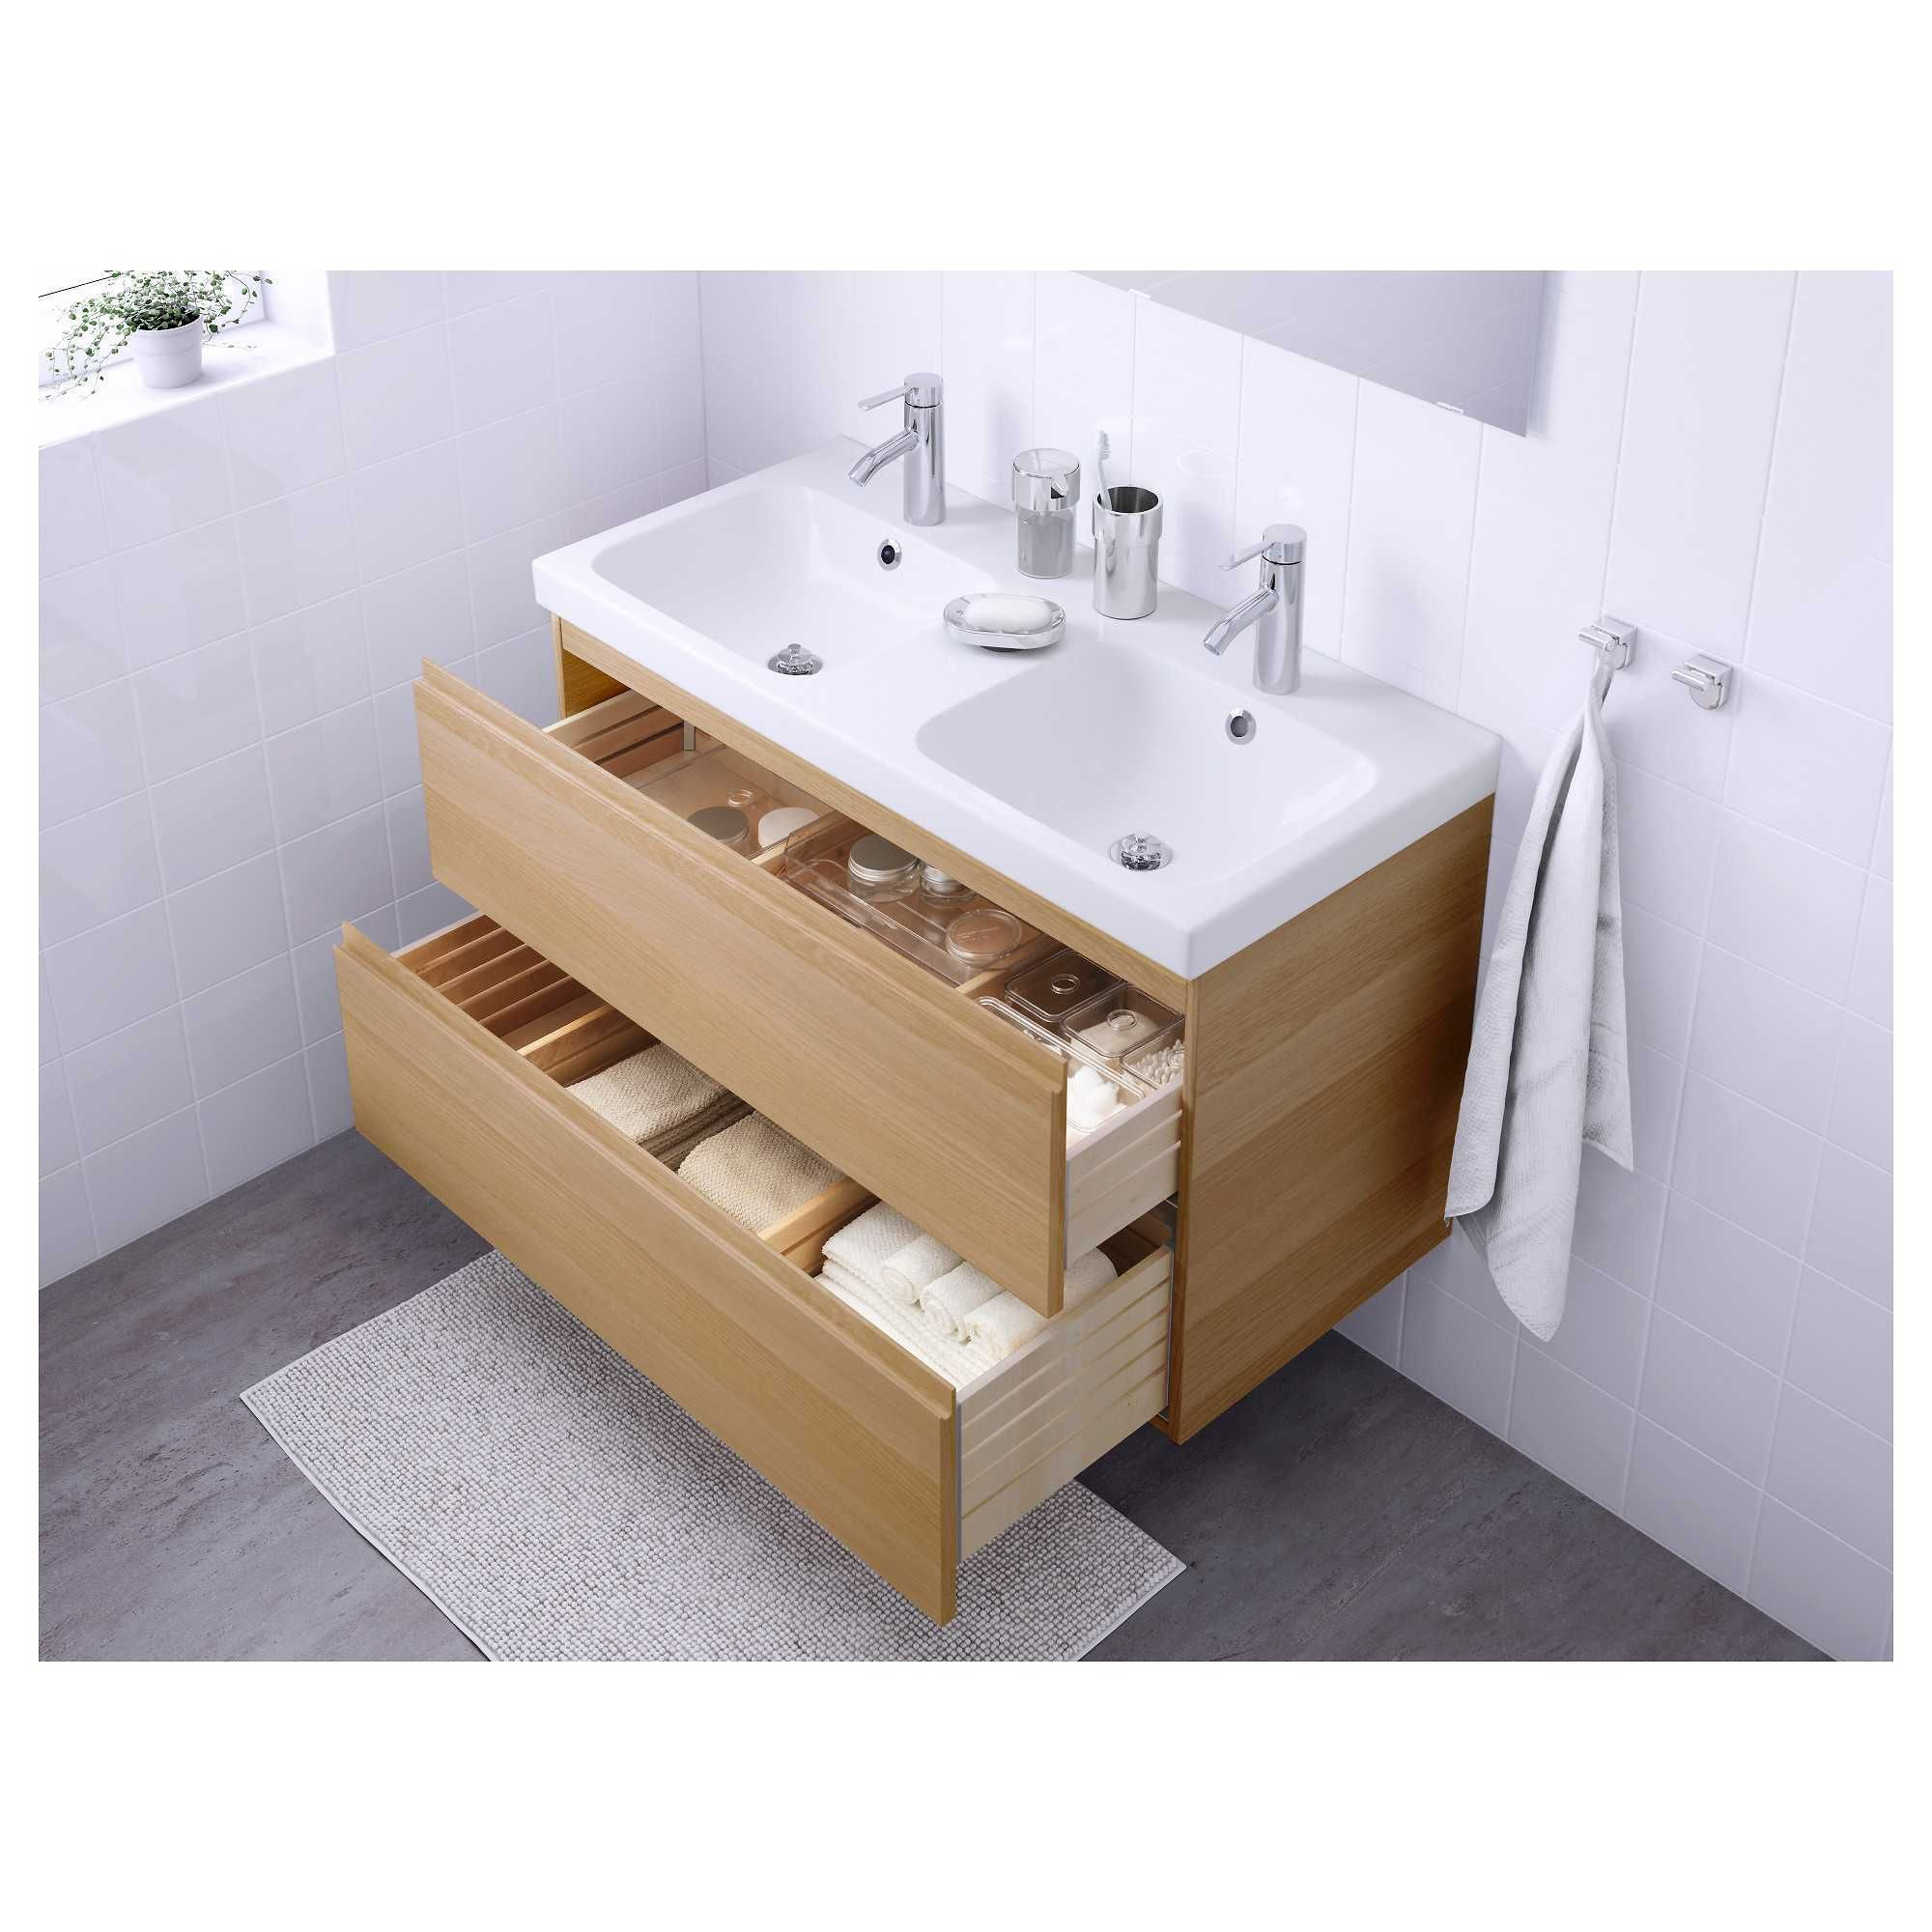 17 Nouveau Ikea Double Vasque Image in 17  Bathroom vanity